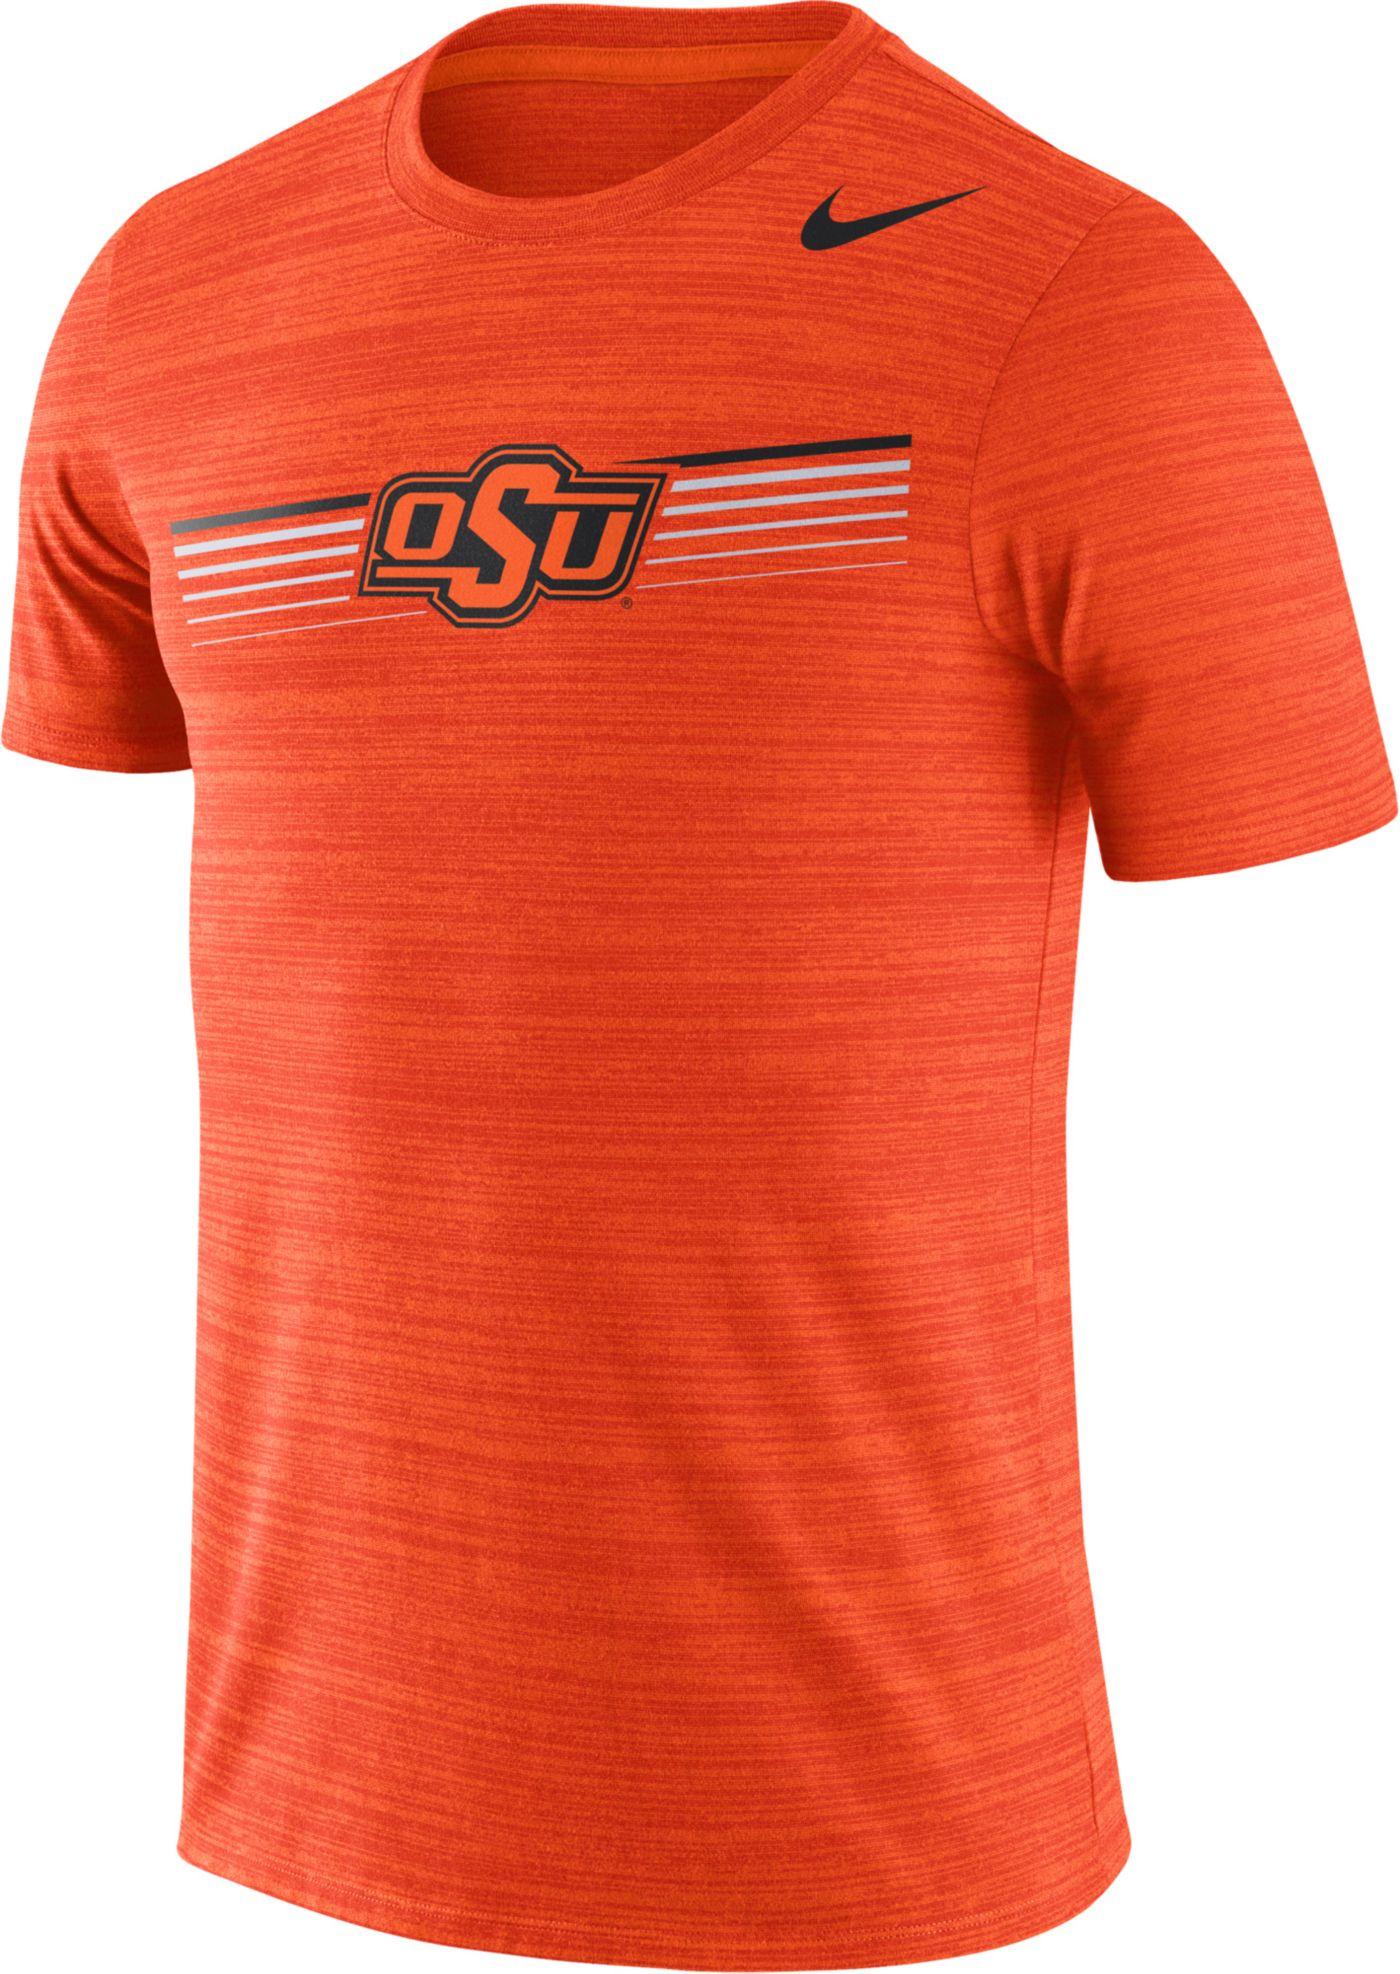 Nike Men's Oklahoma State Cowboys Orange Velocity Legend Graphic T-Shirt